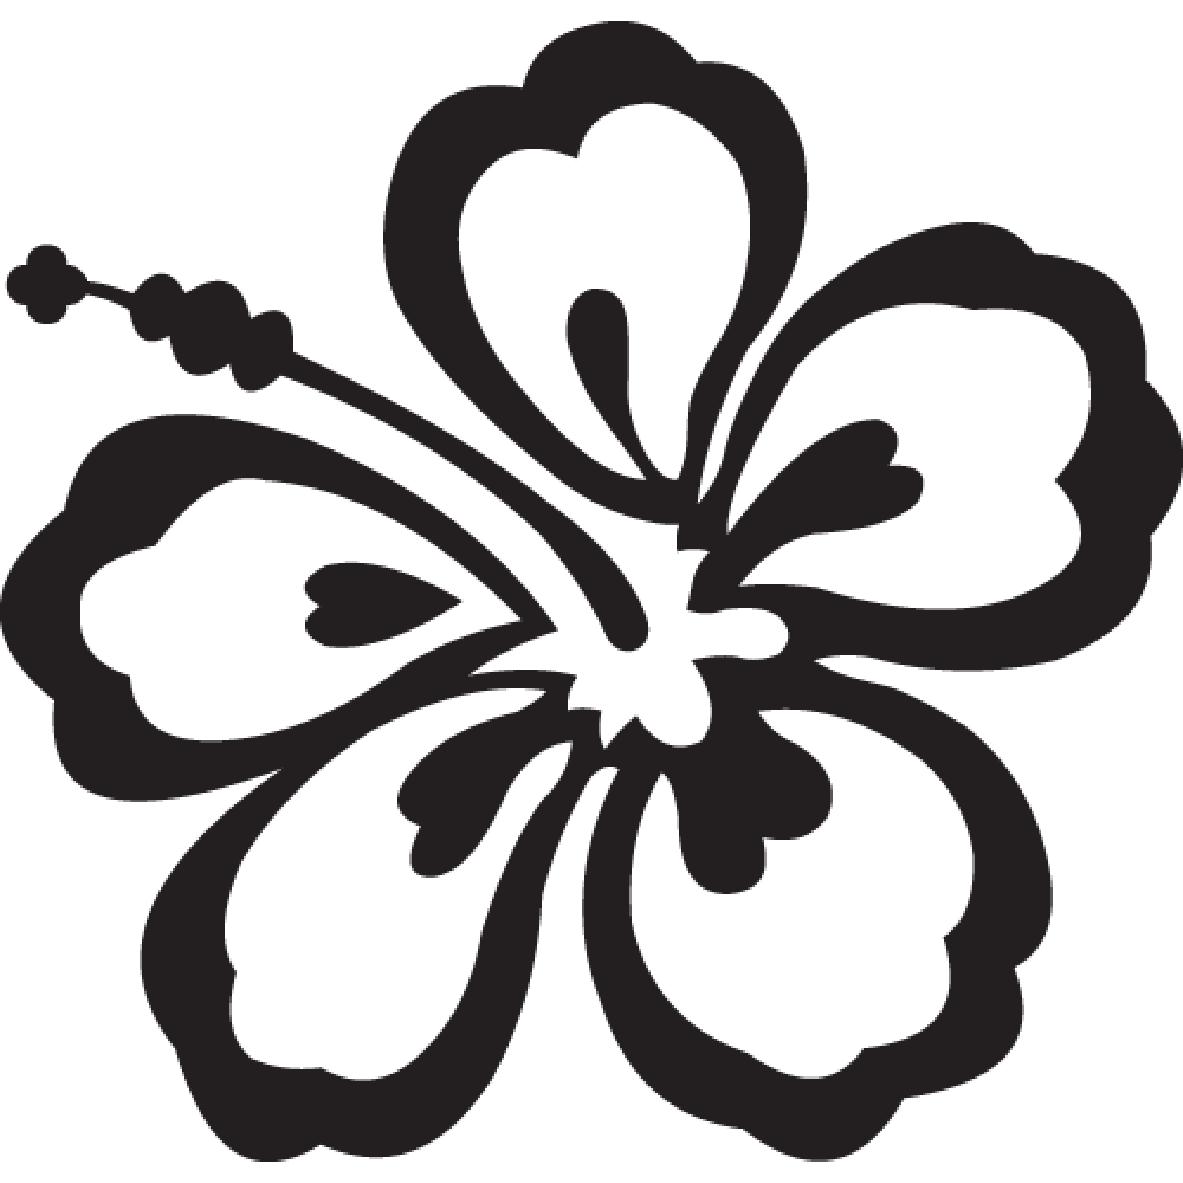 Hibiscus clipart free clipart transparent download Free Hibiscus Flower Cliparts, Download Free Clip Art, Free Clip Art ... clipart transparent download